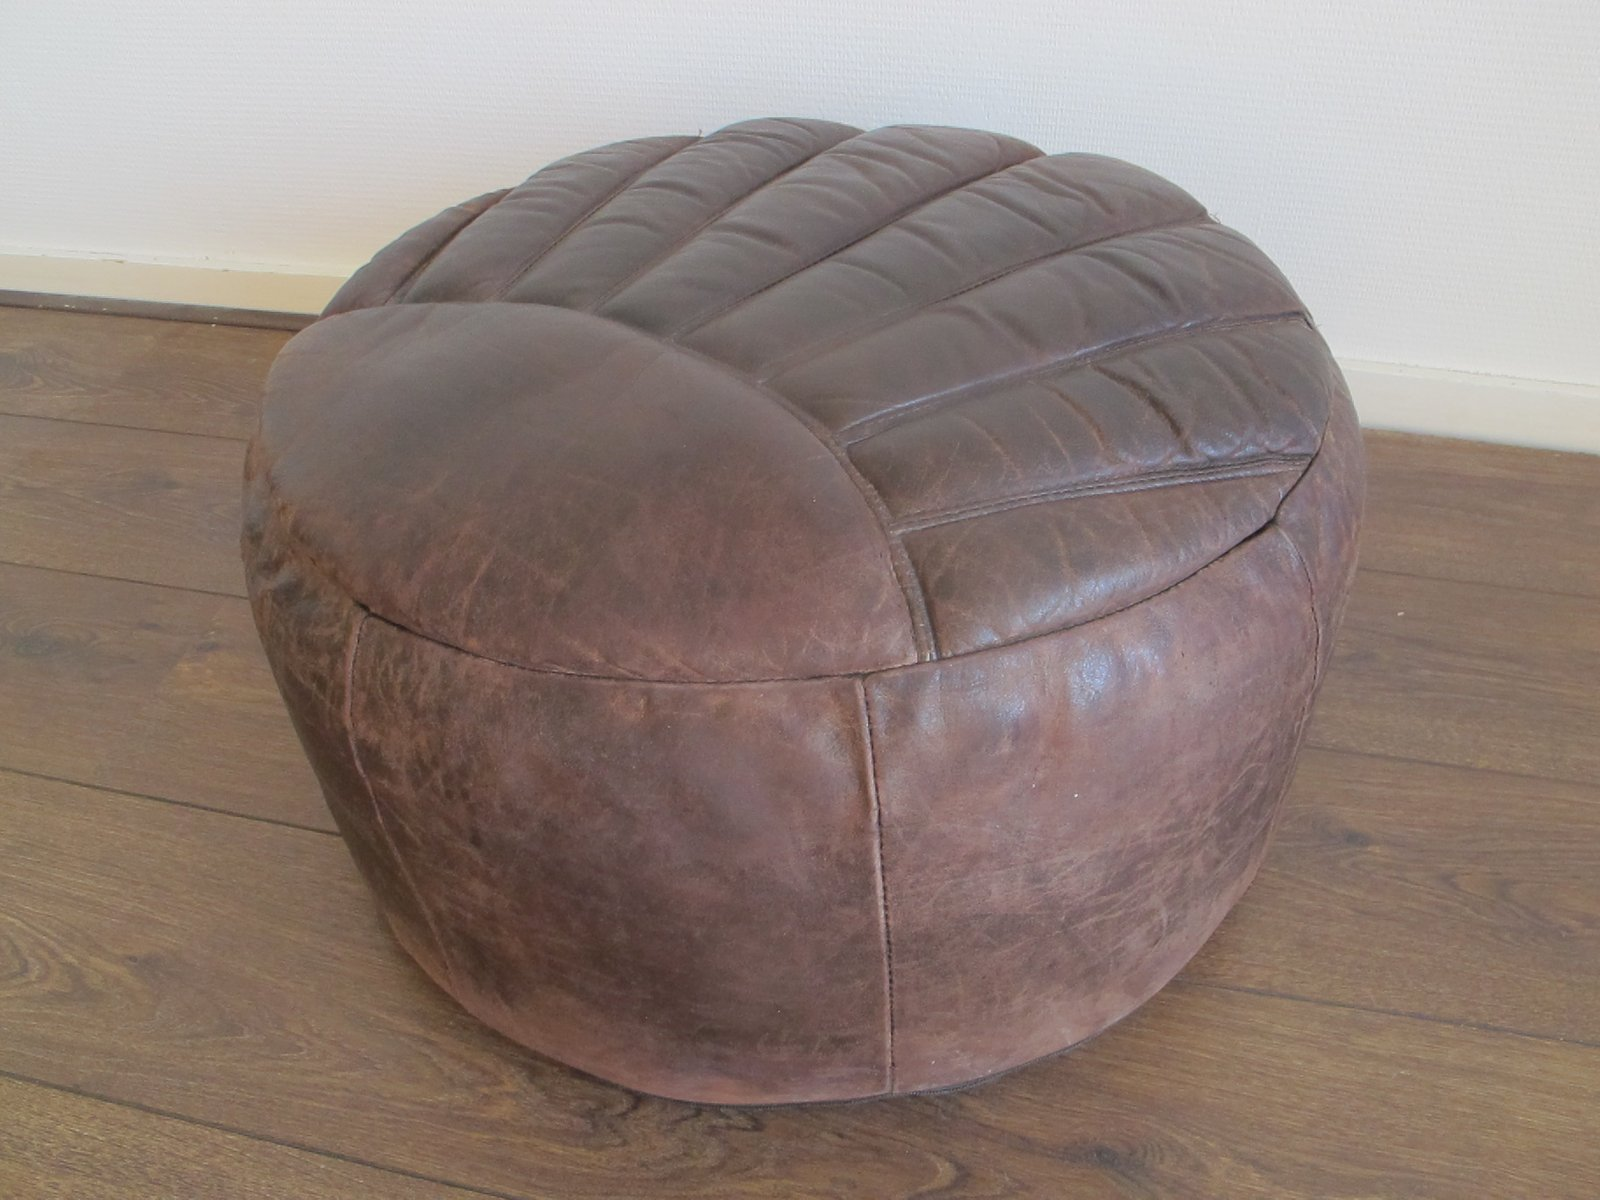 pouf vintage en cuir marron 1960s en vente sur pamono. Black Bedroom Furniture Sets. Home Design Ideas